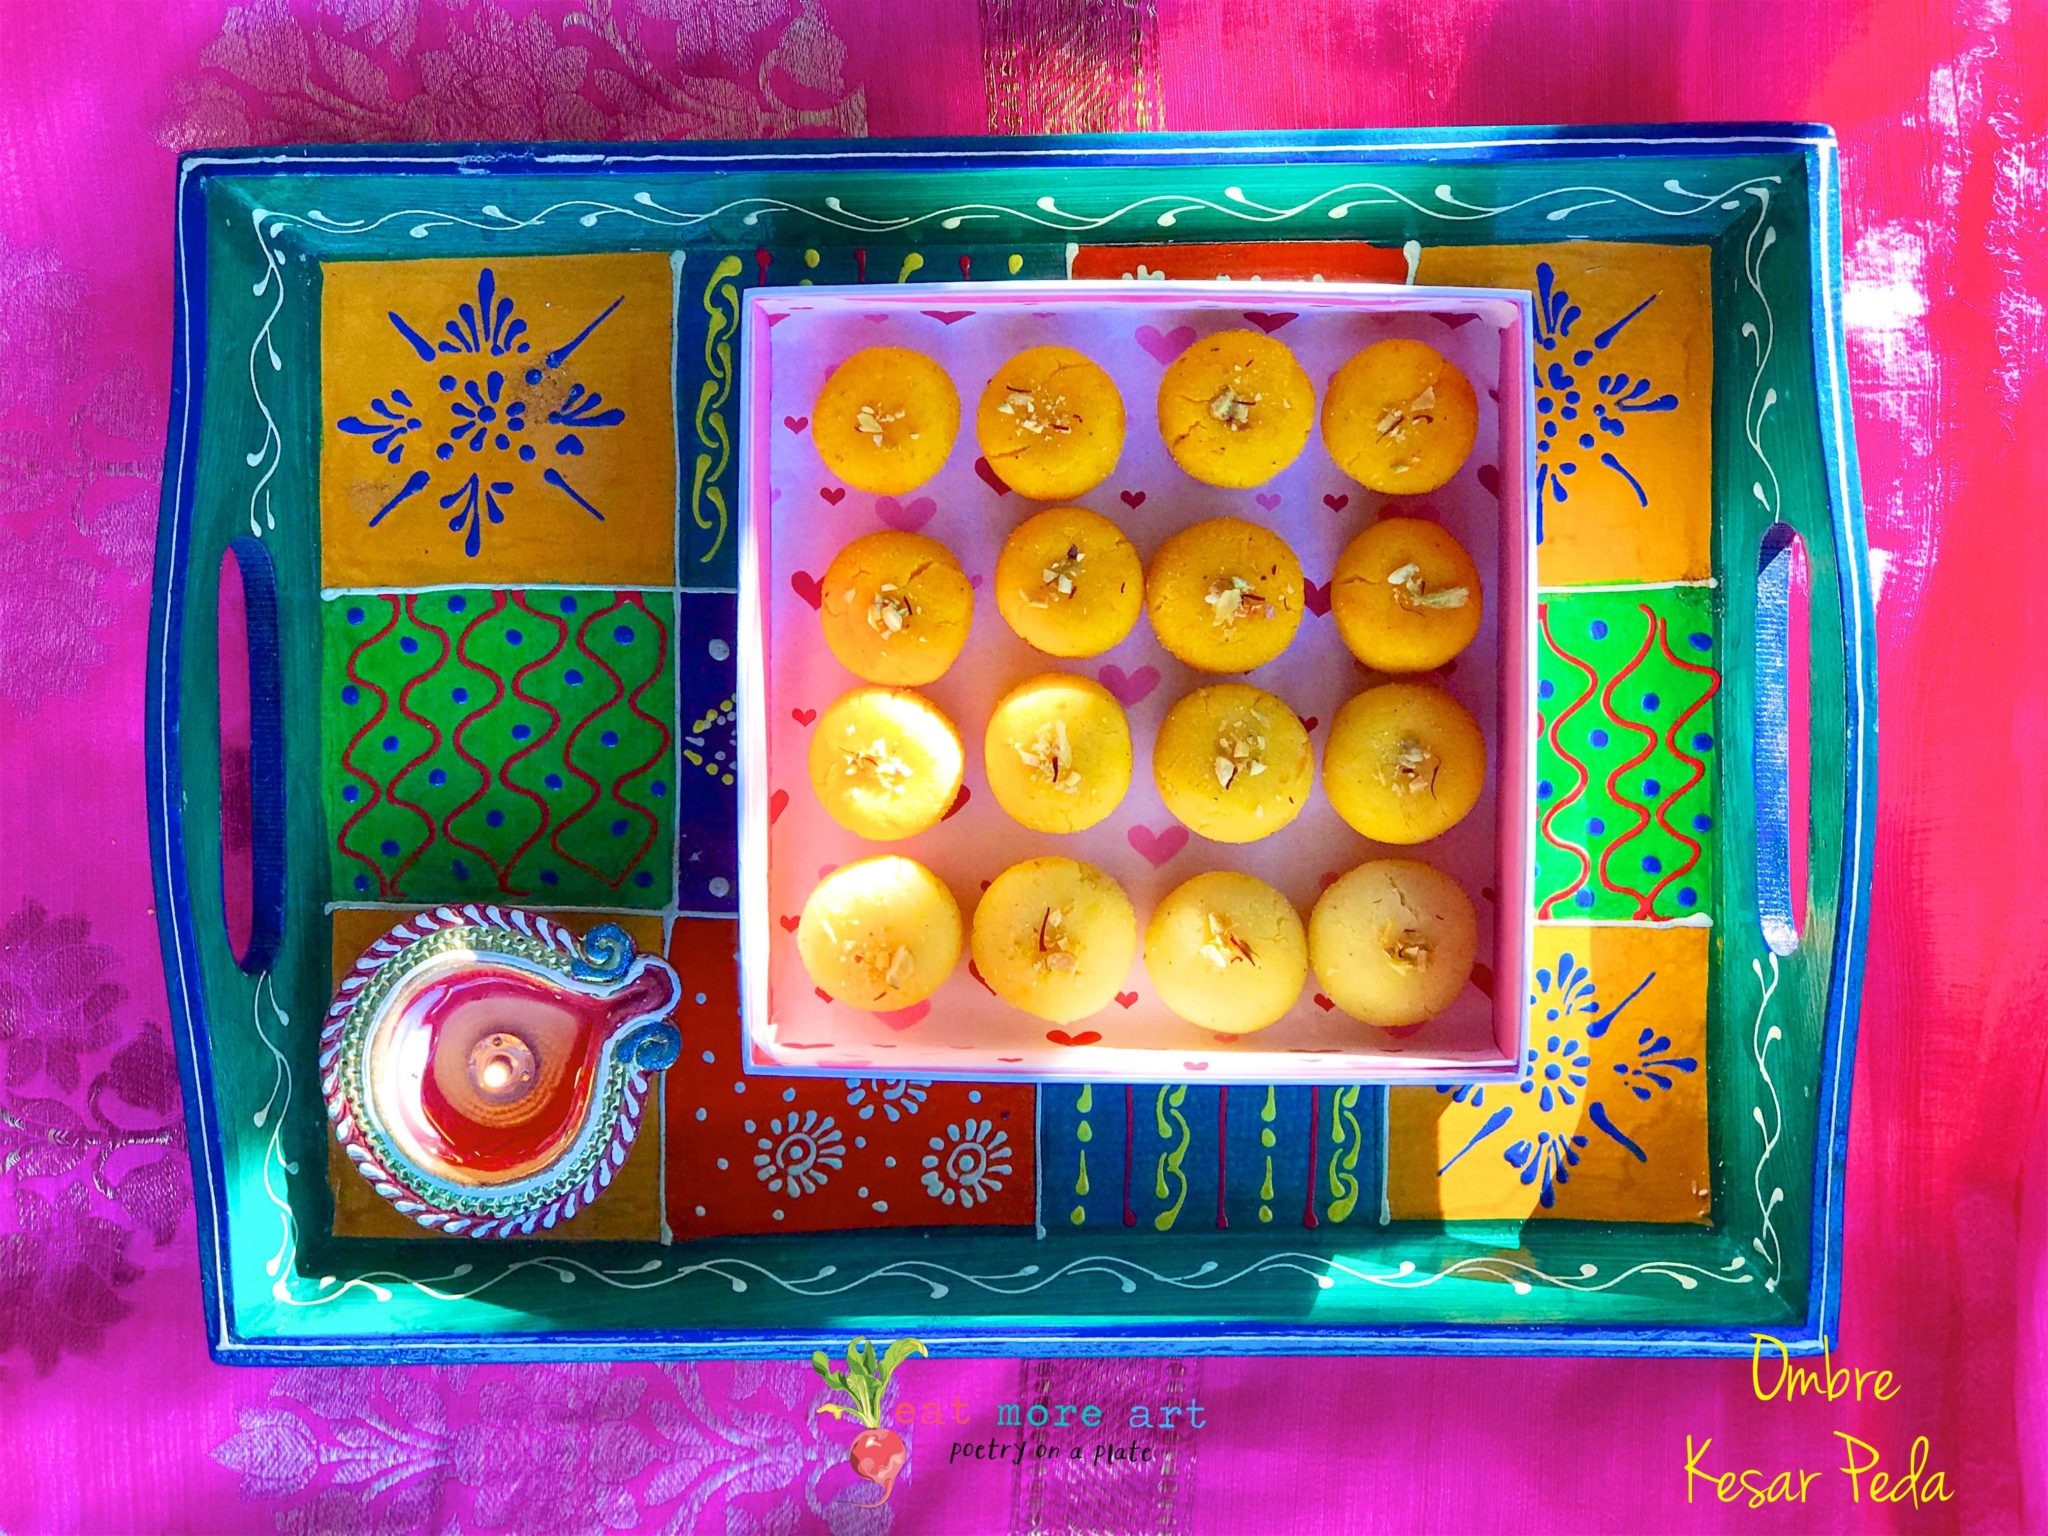 Ombre saffron peda in shades of yellow and orange arranged in a box decorative colorful tray